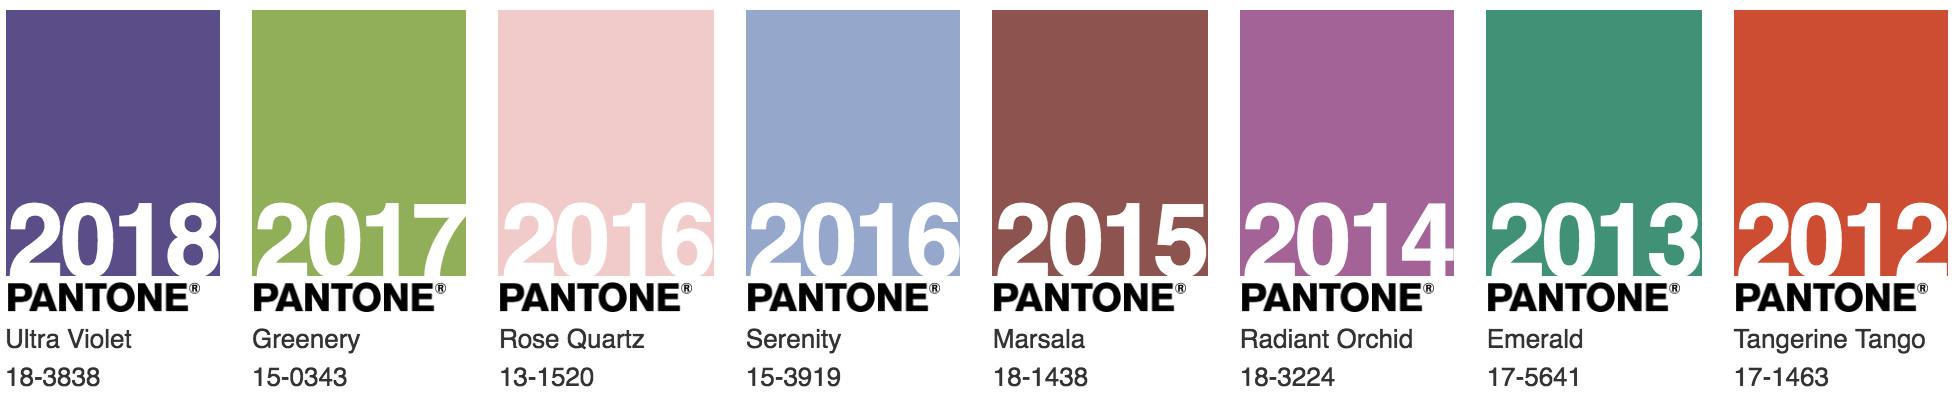 Pantone年度代表色近8年